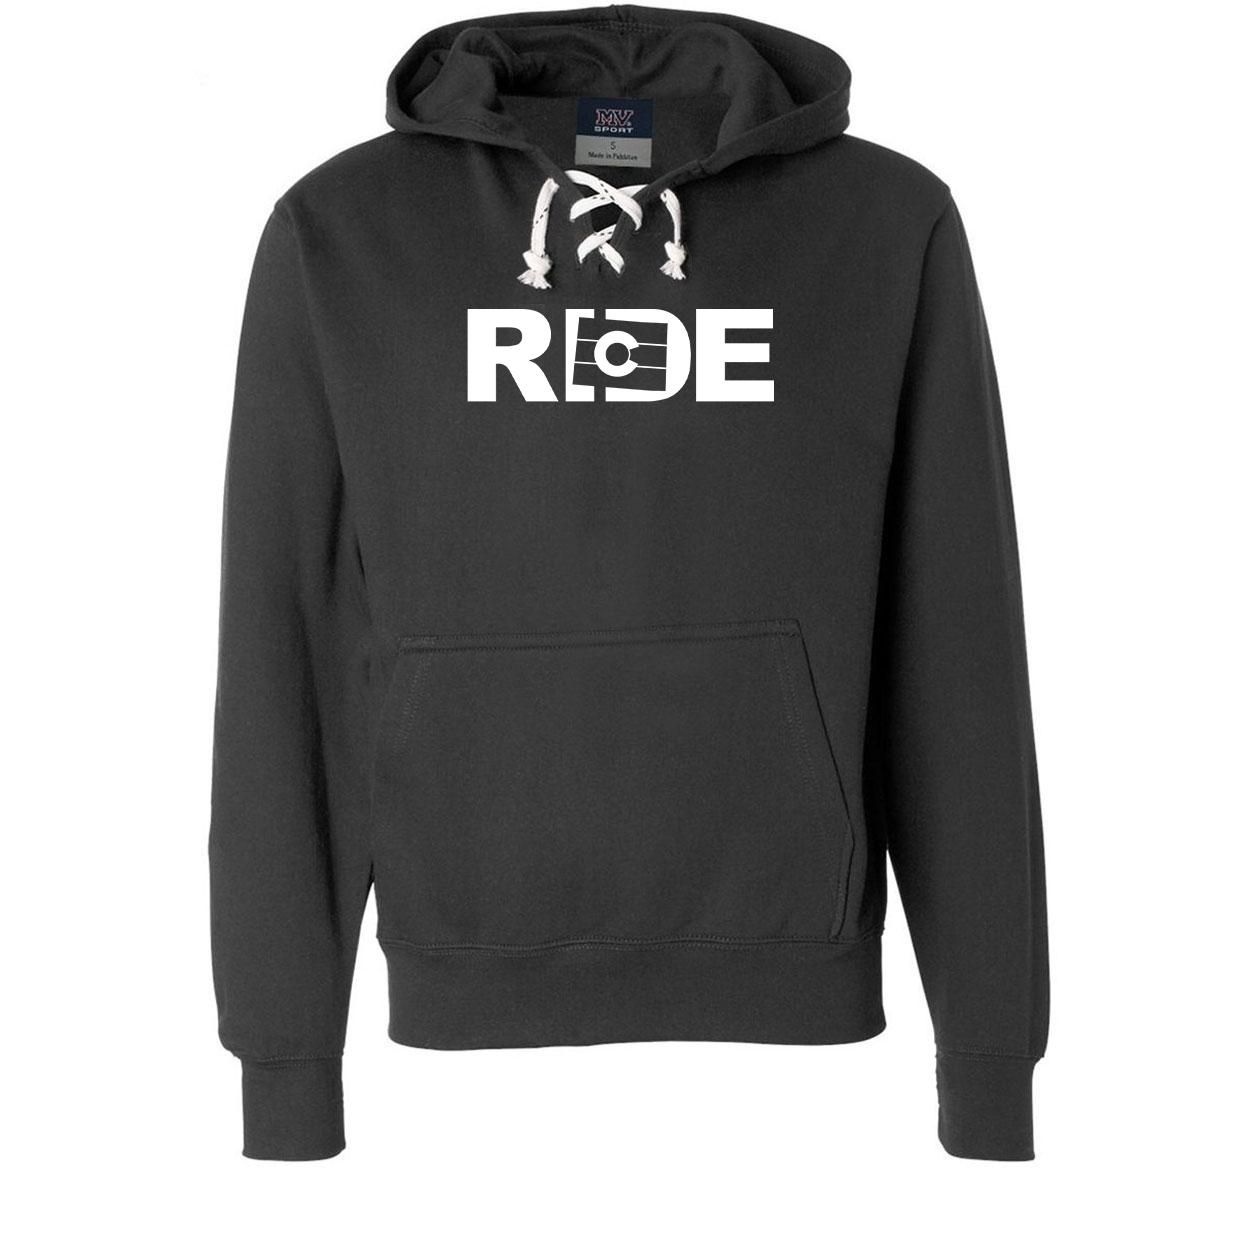 Ride Colorado Classic Unisex Premium Hockey Sweatshirt Black (White Logo)